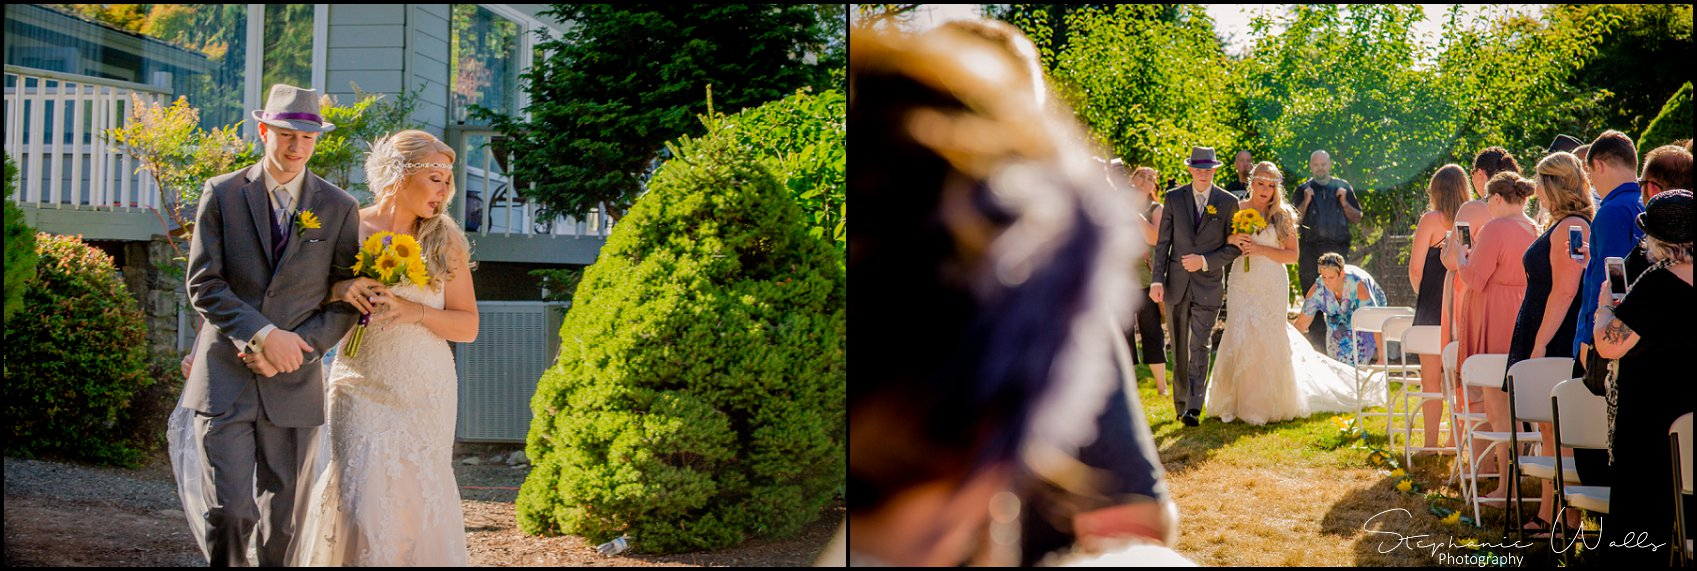 Everist Wedding 133 Patti & Bobbys | Troll Haven Castle & Bandy Farms | Sequim, Wa Wedding Photographer